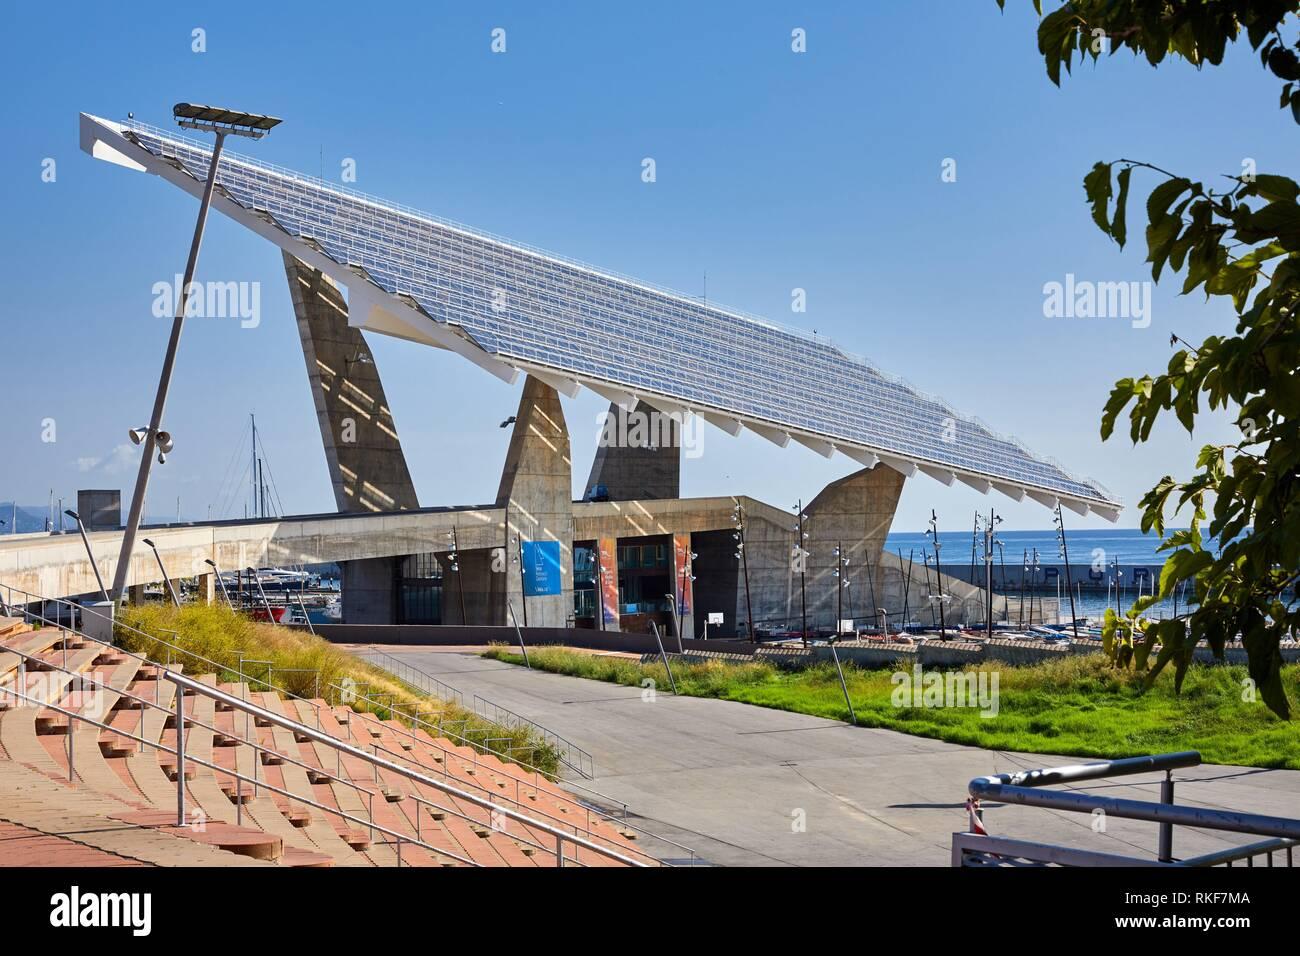 Photovoltaic pergola, by Elias Torres & José Antonio Martínez Lapeña, Forum, Barcelona, Catalunya, Spain, Europe - Stock Image